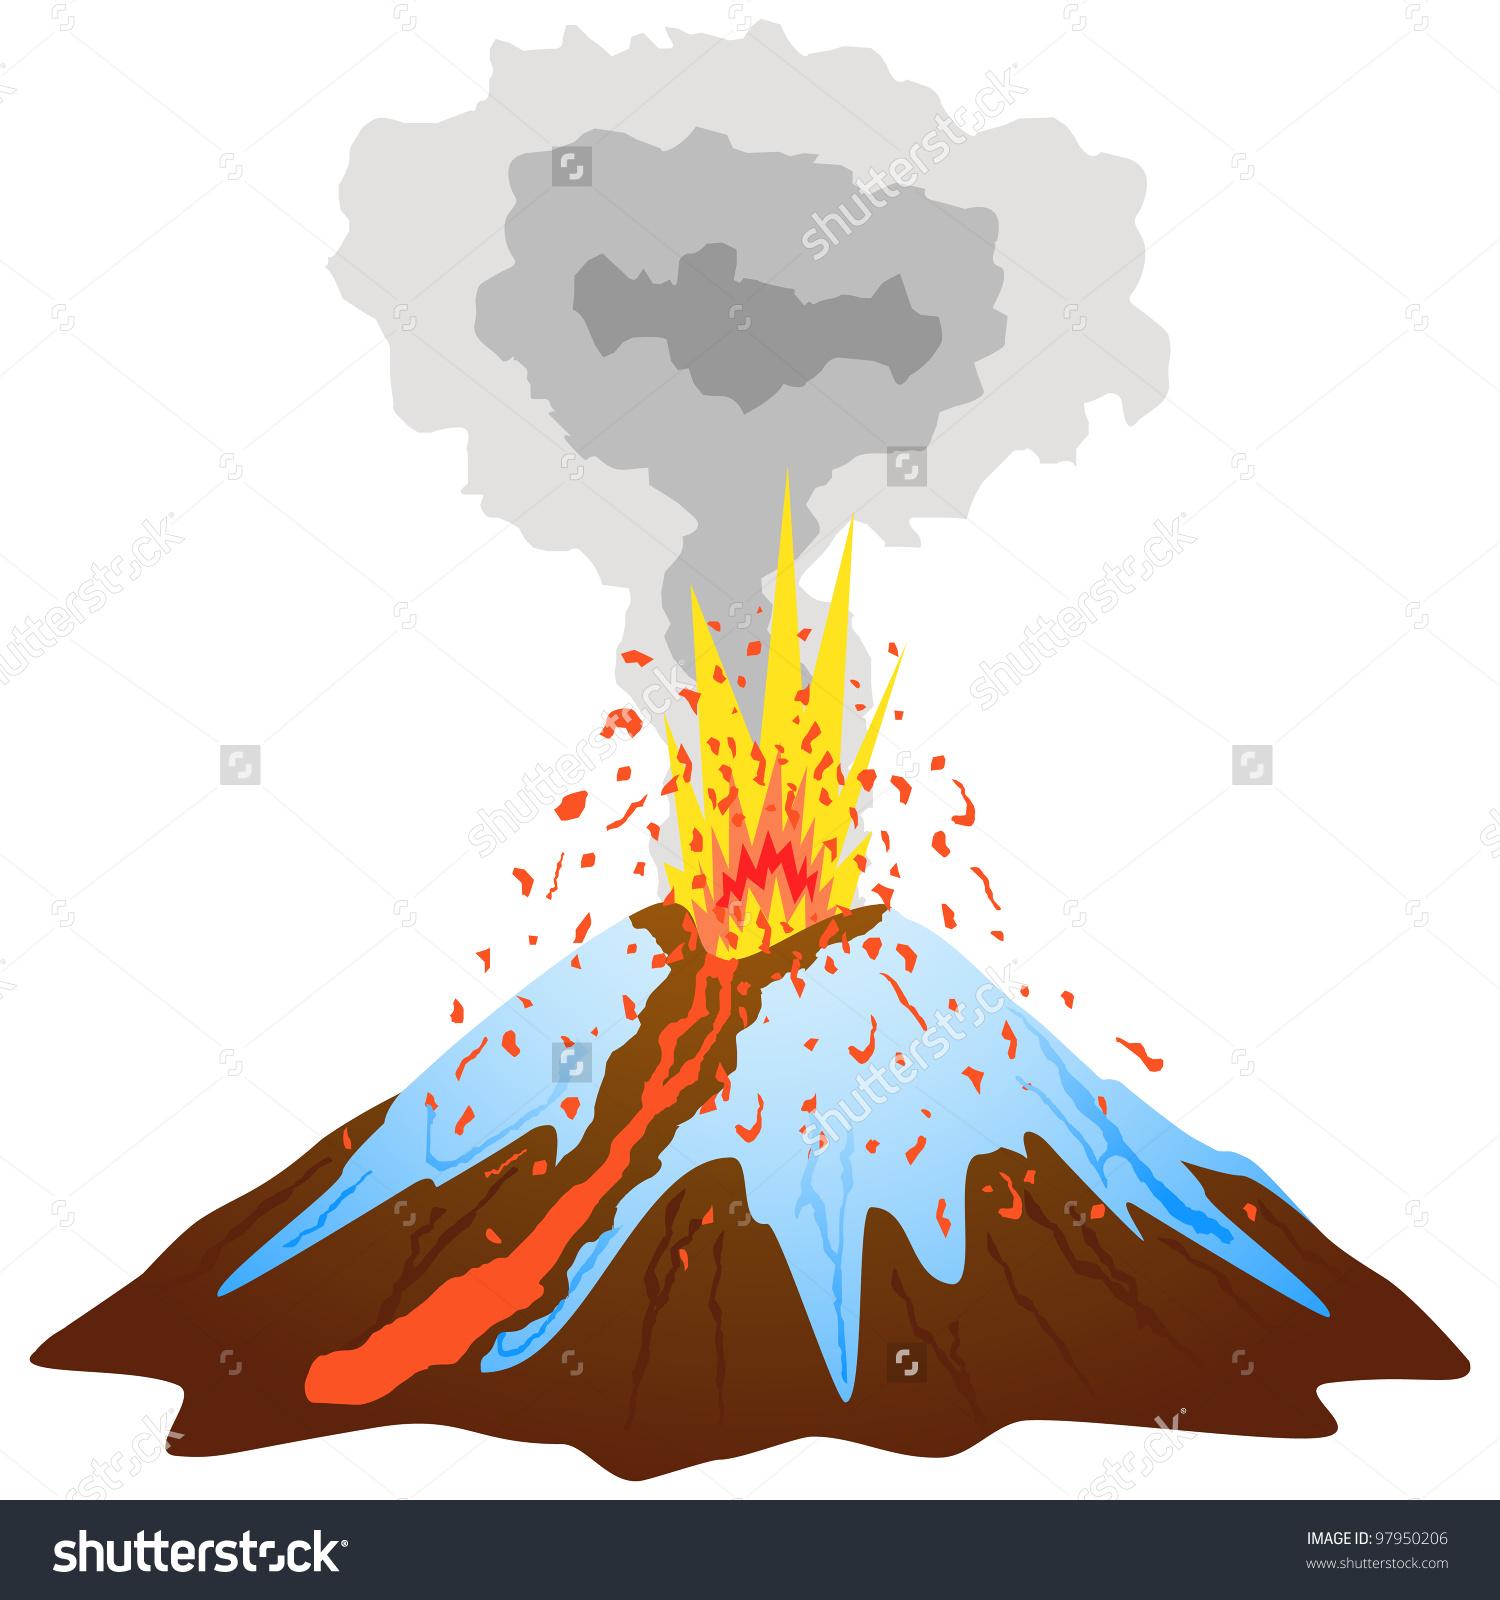 free clipart volcano erupting - photo #50